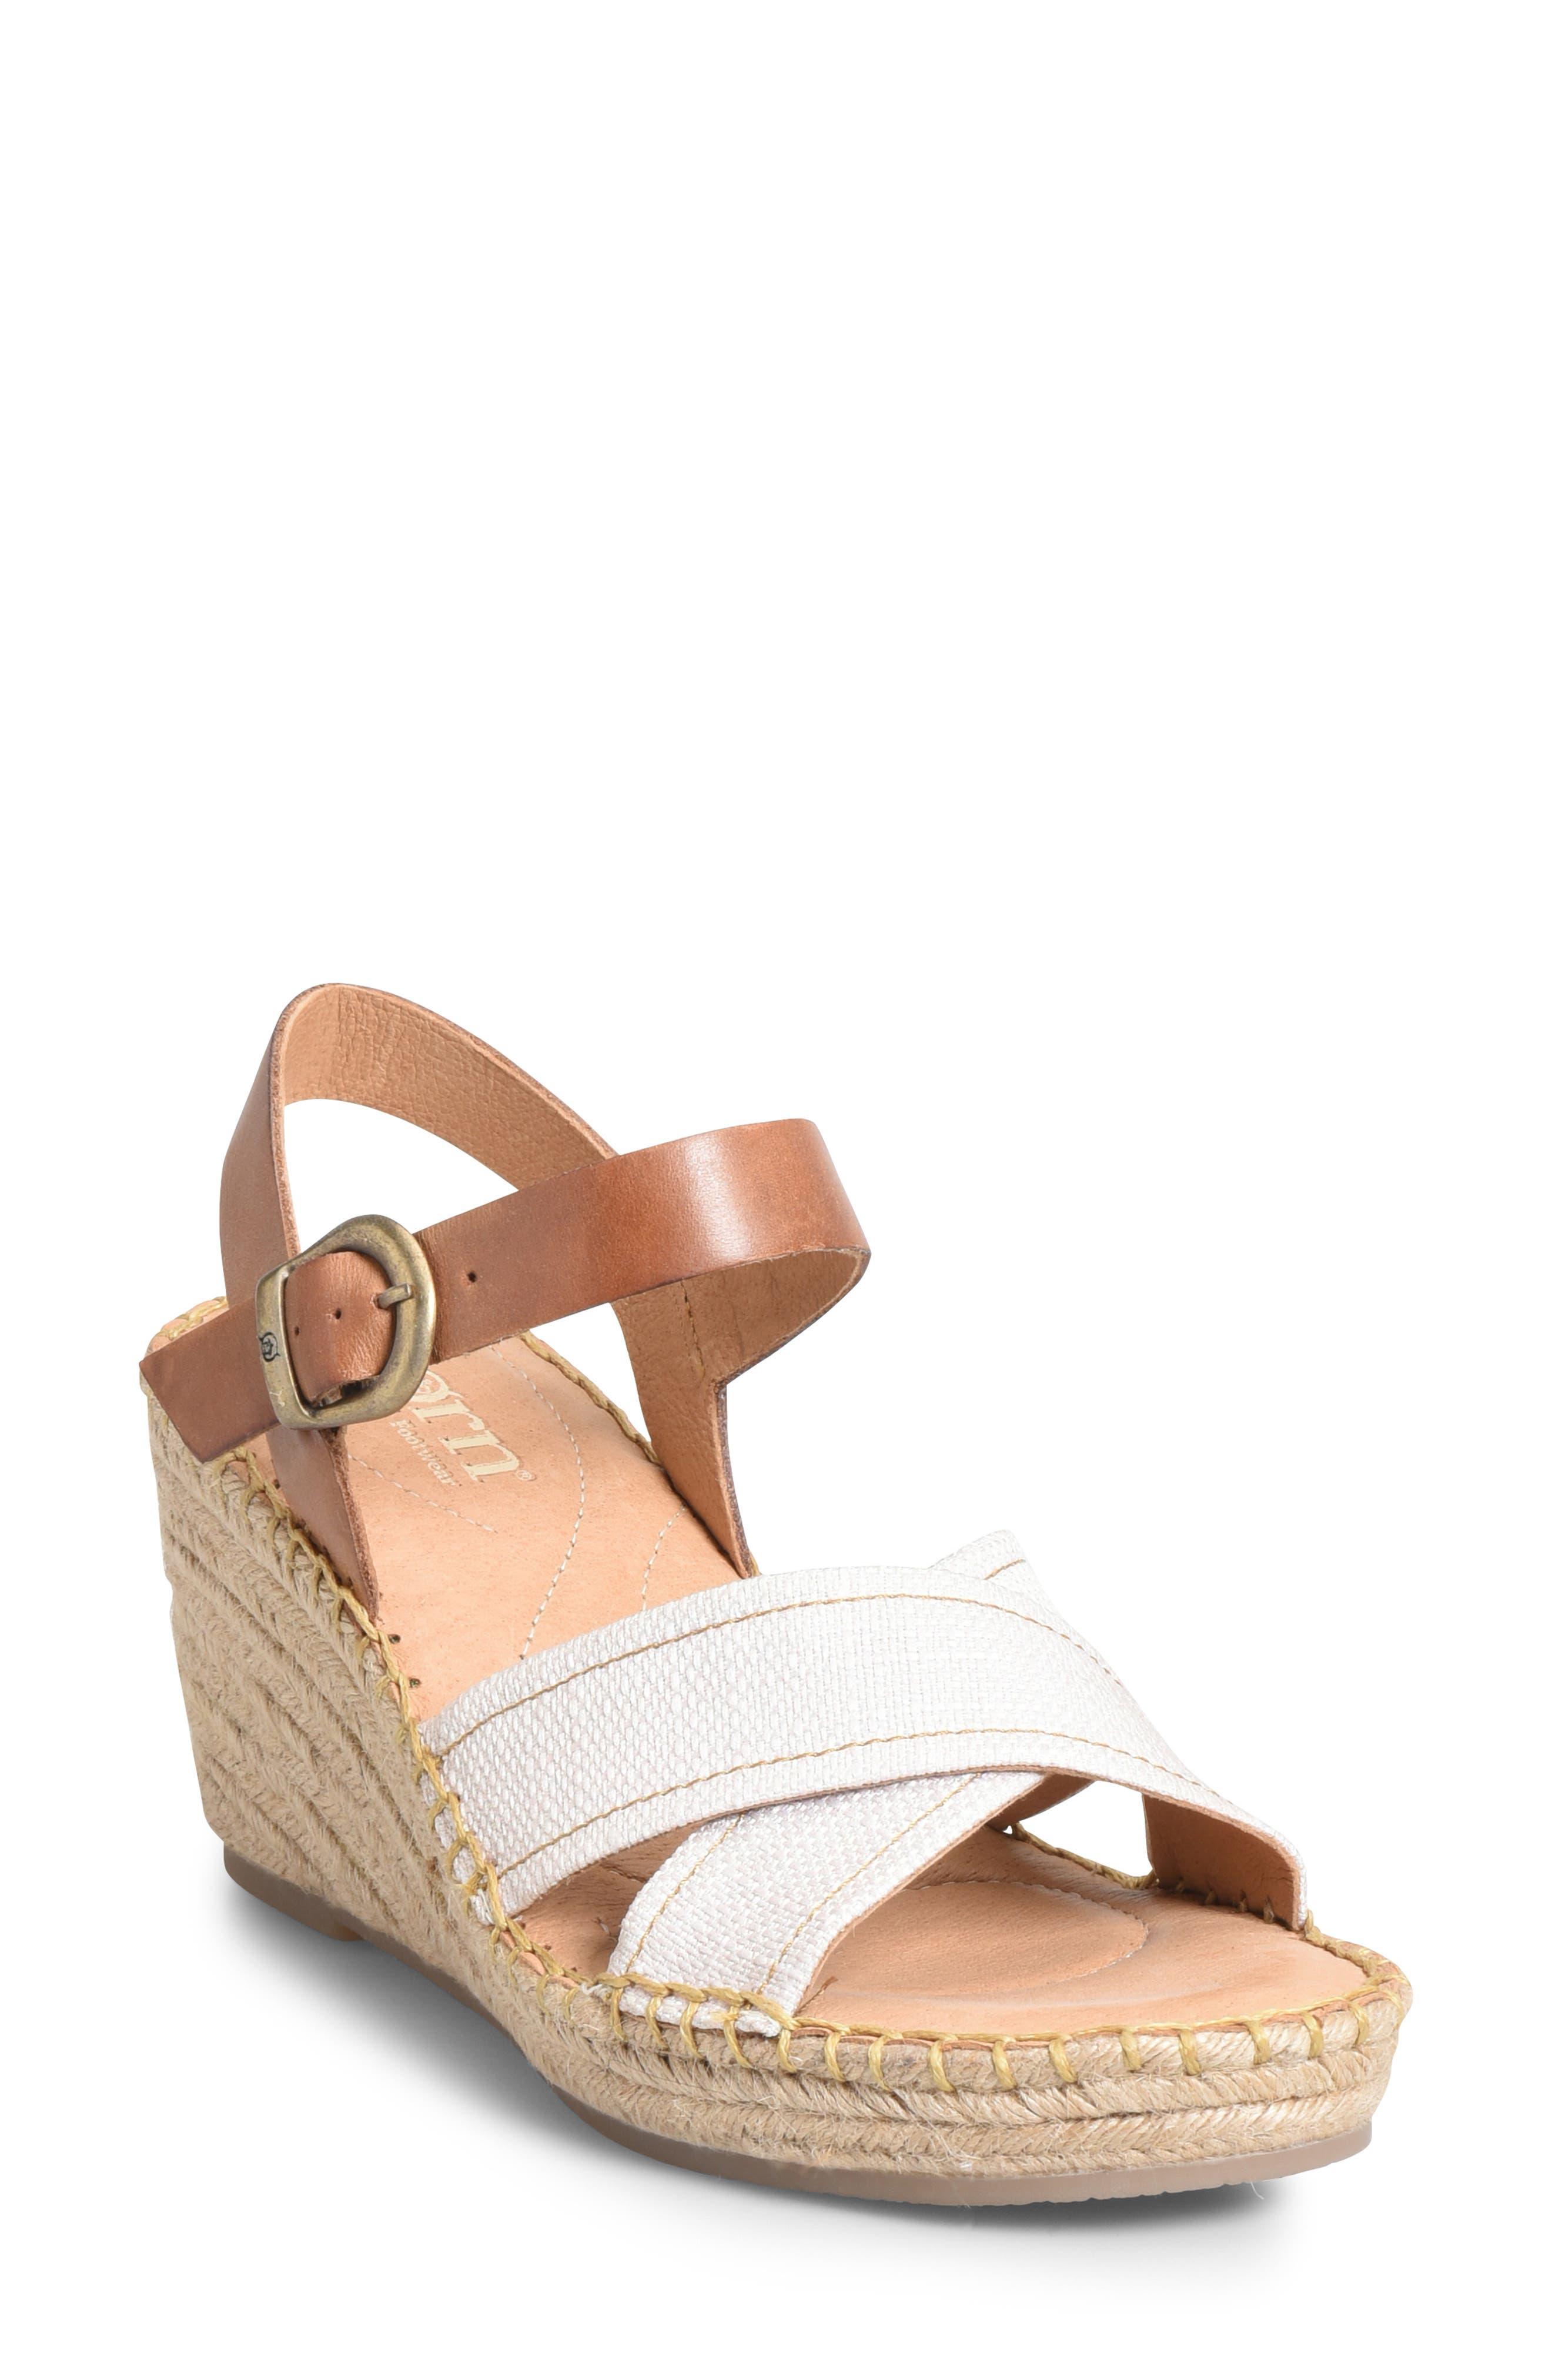 B?rn Payette Wedge Sandal, Beige